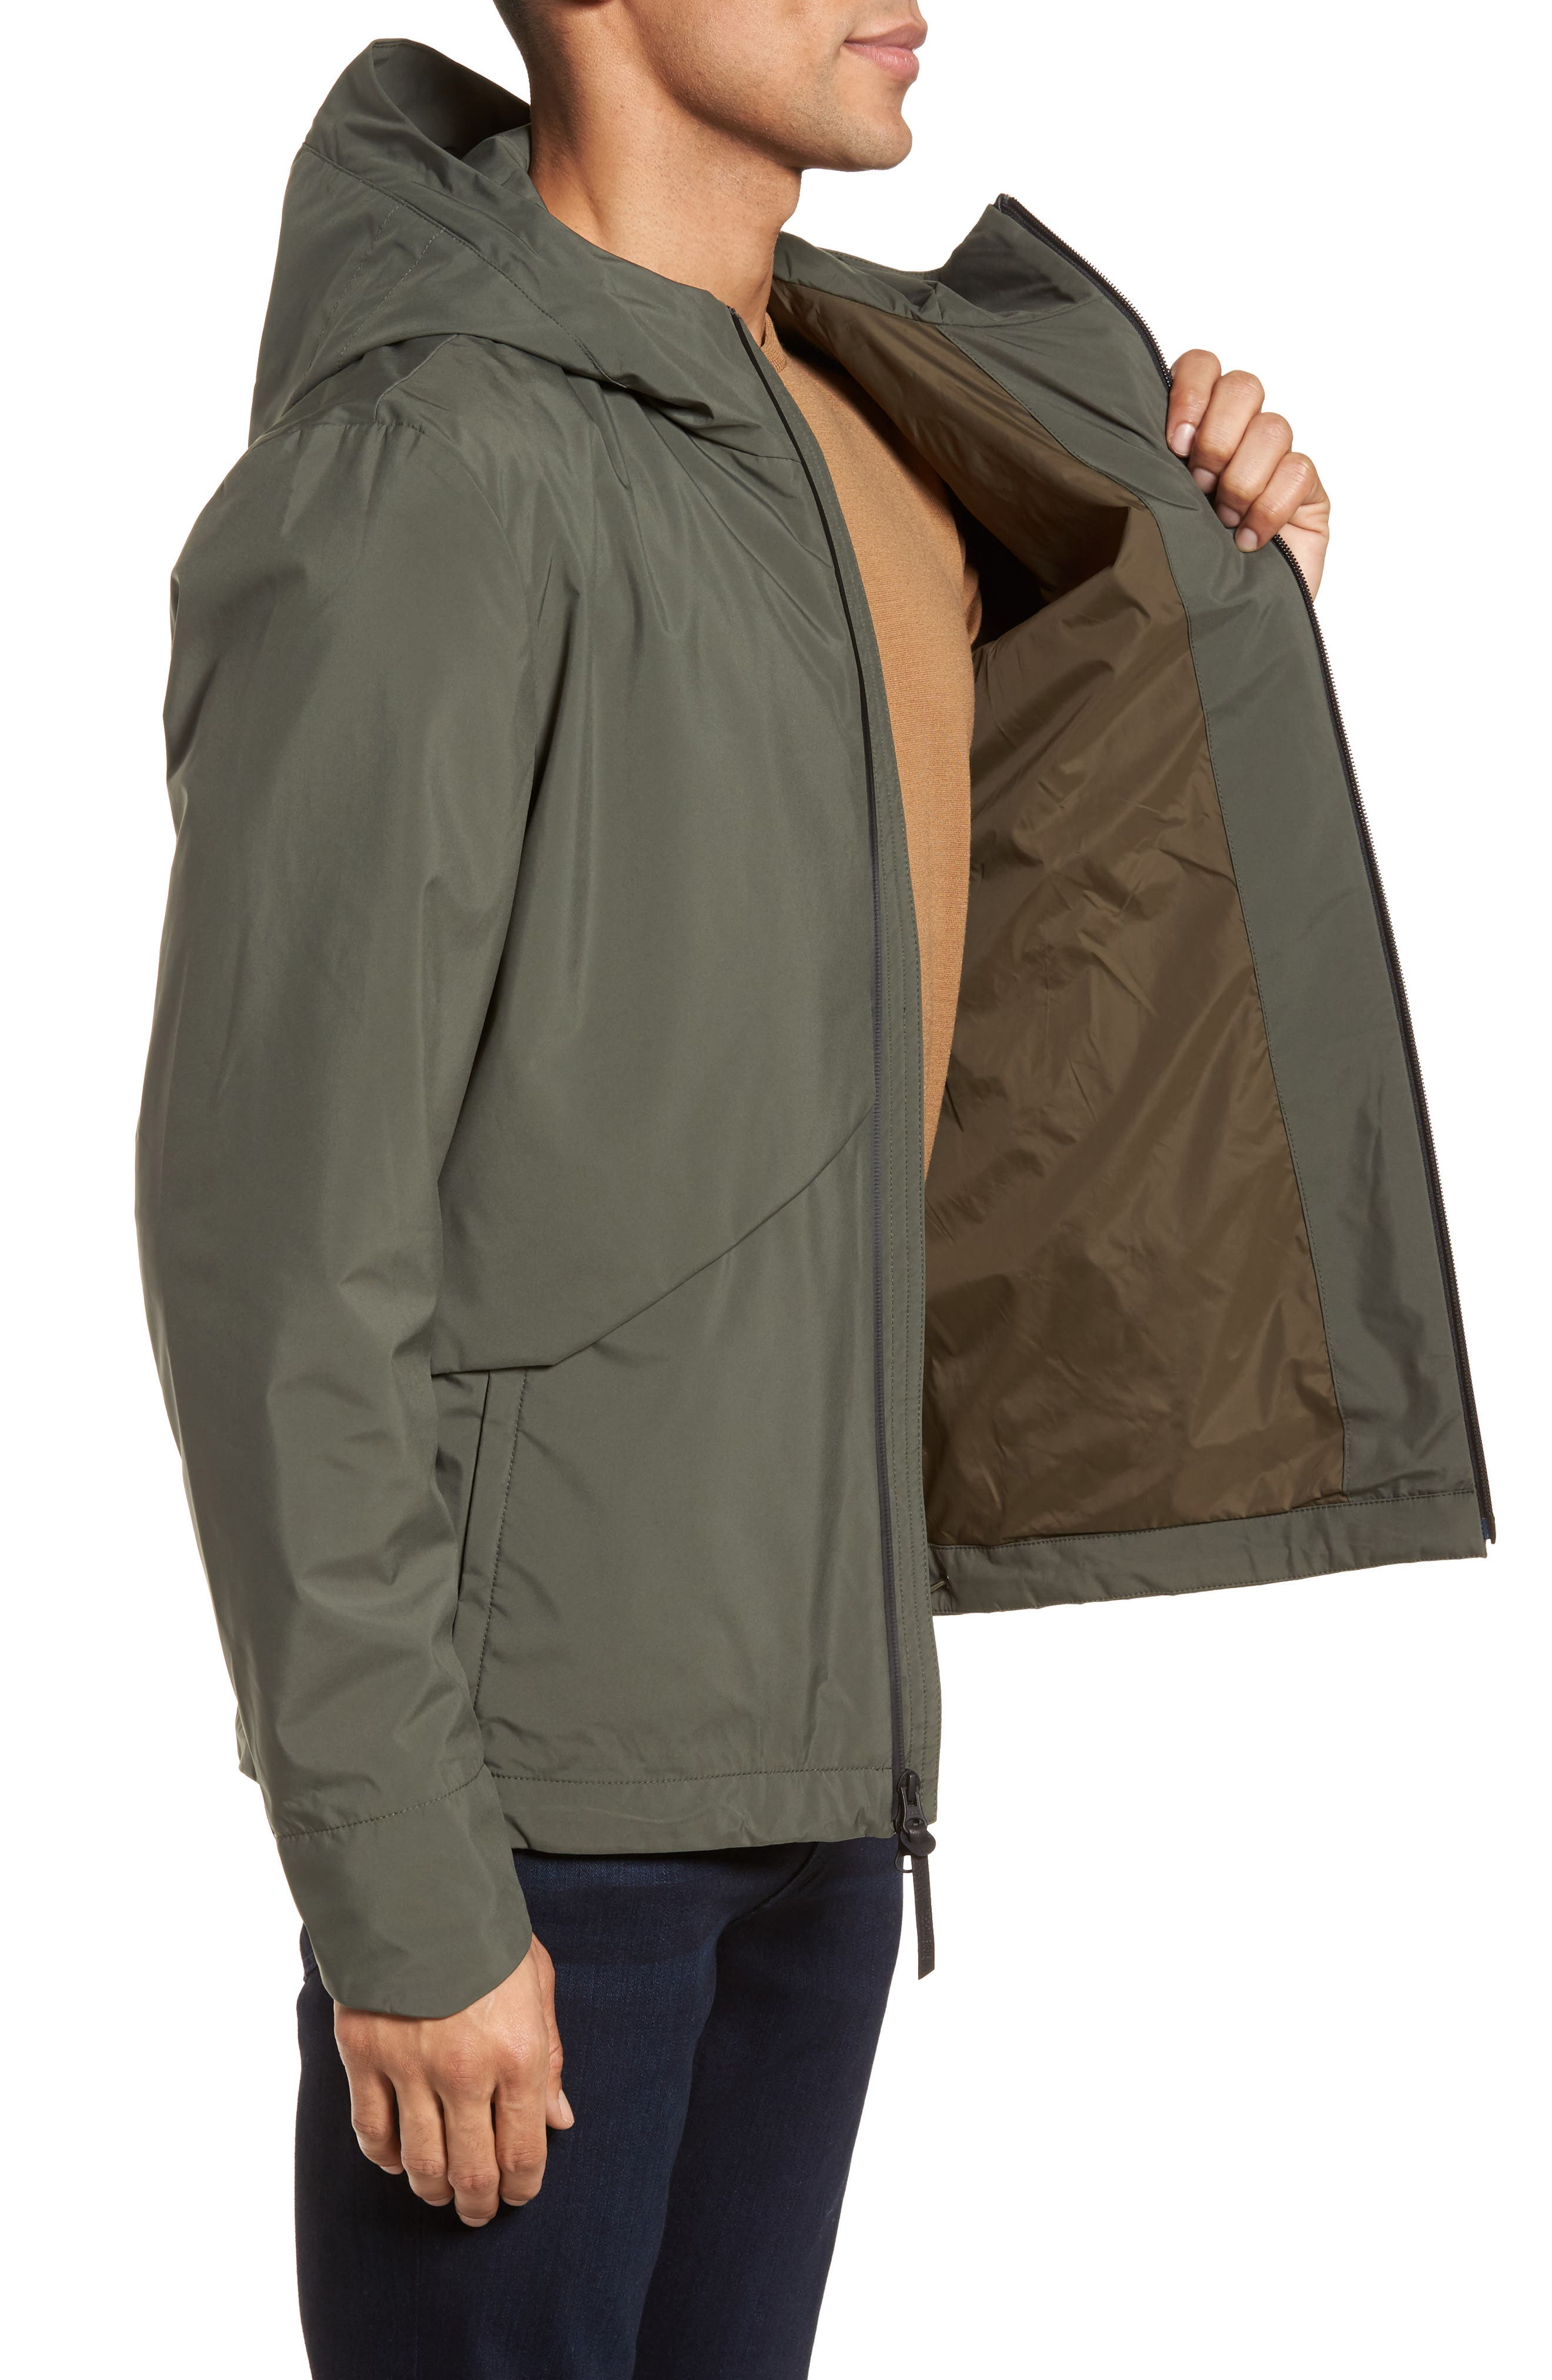 & Bros. Navigator Field Jacket,                             Alternate thumbnail 3, color,                             382